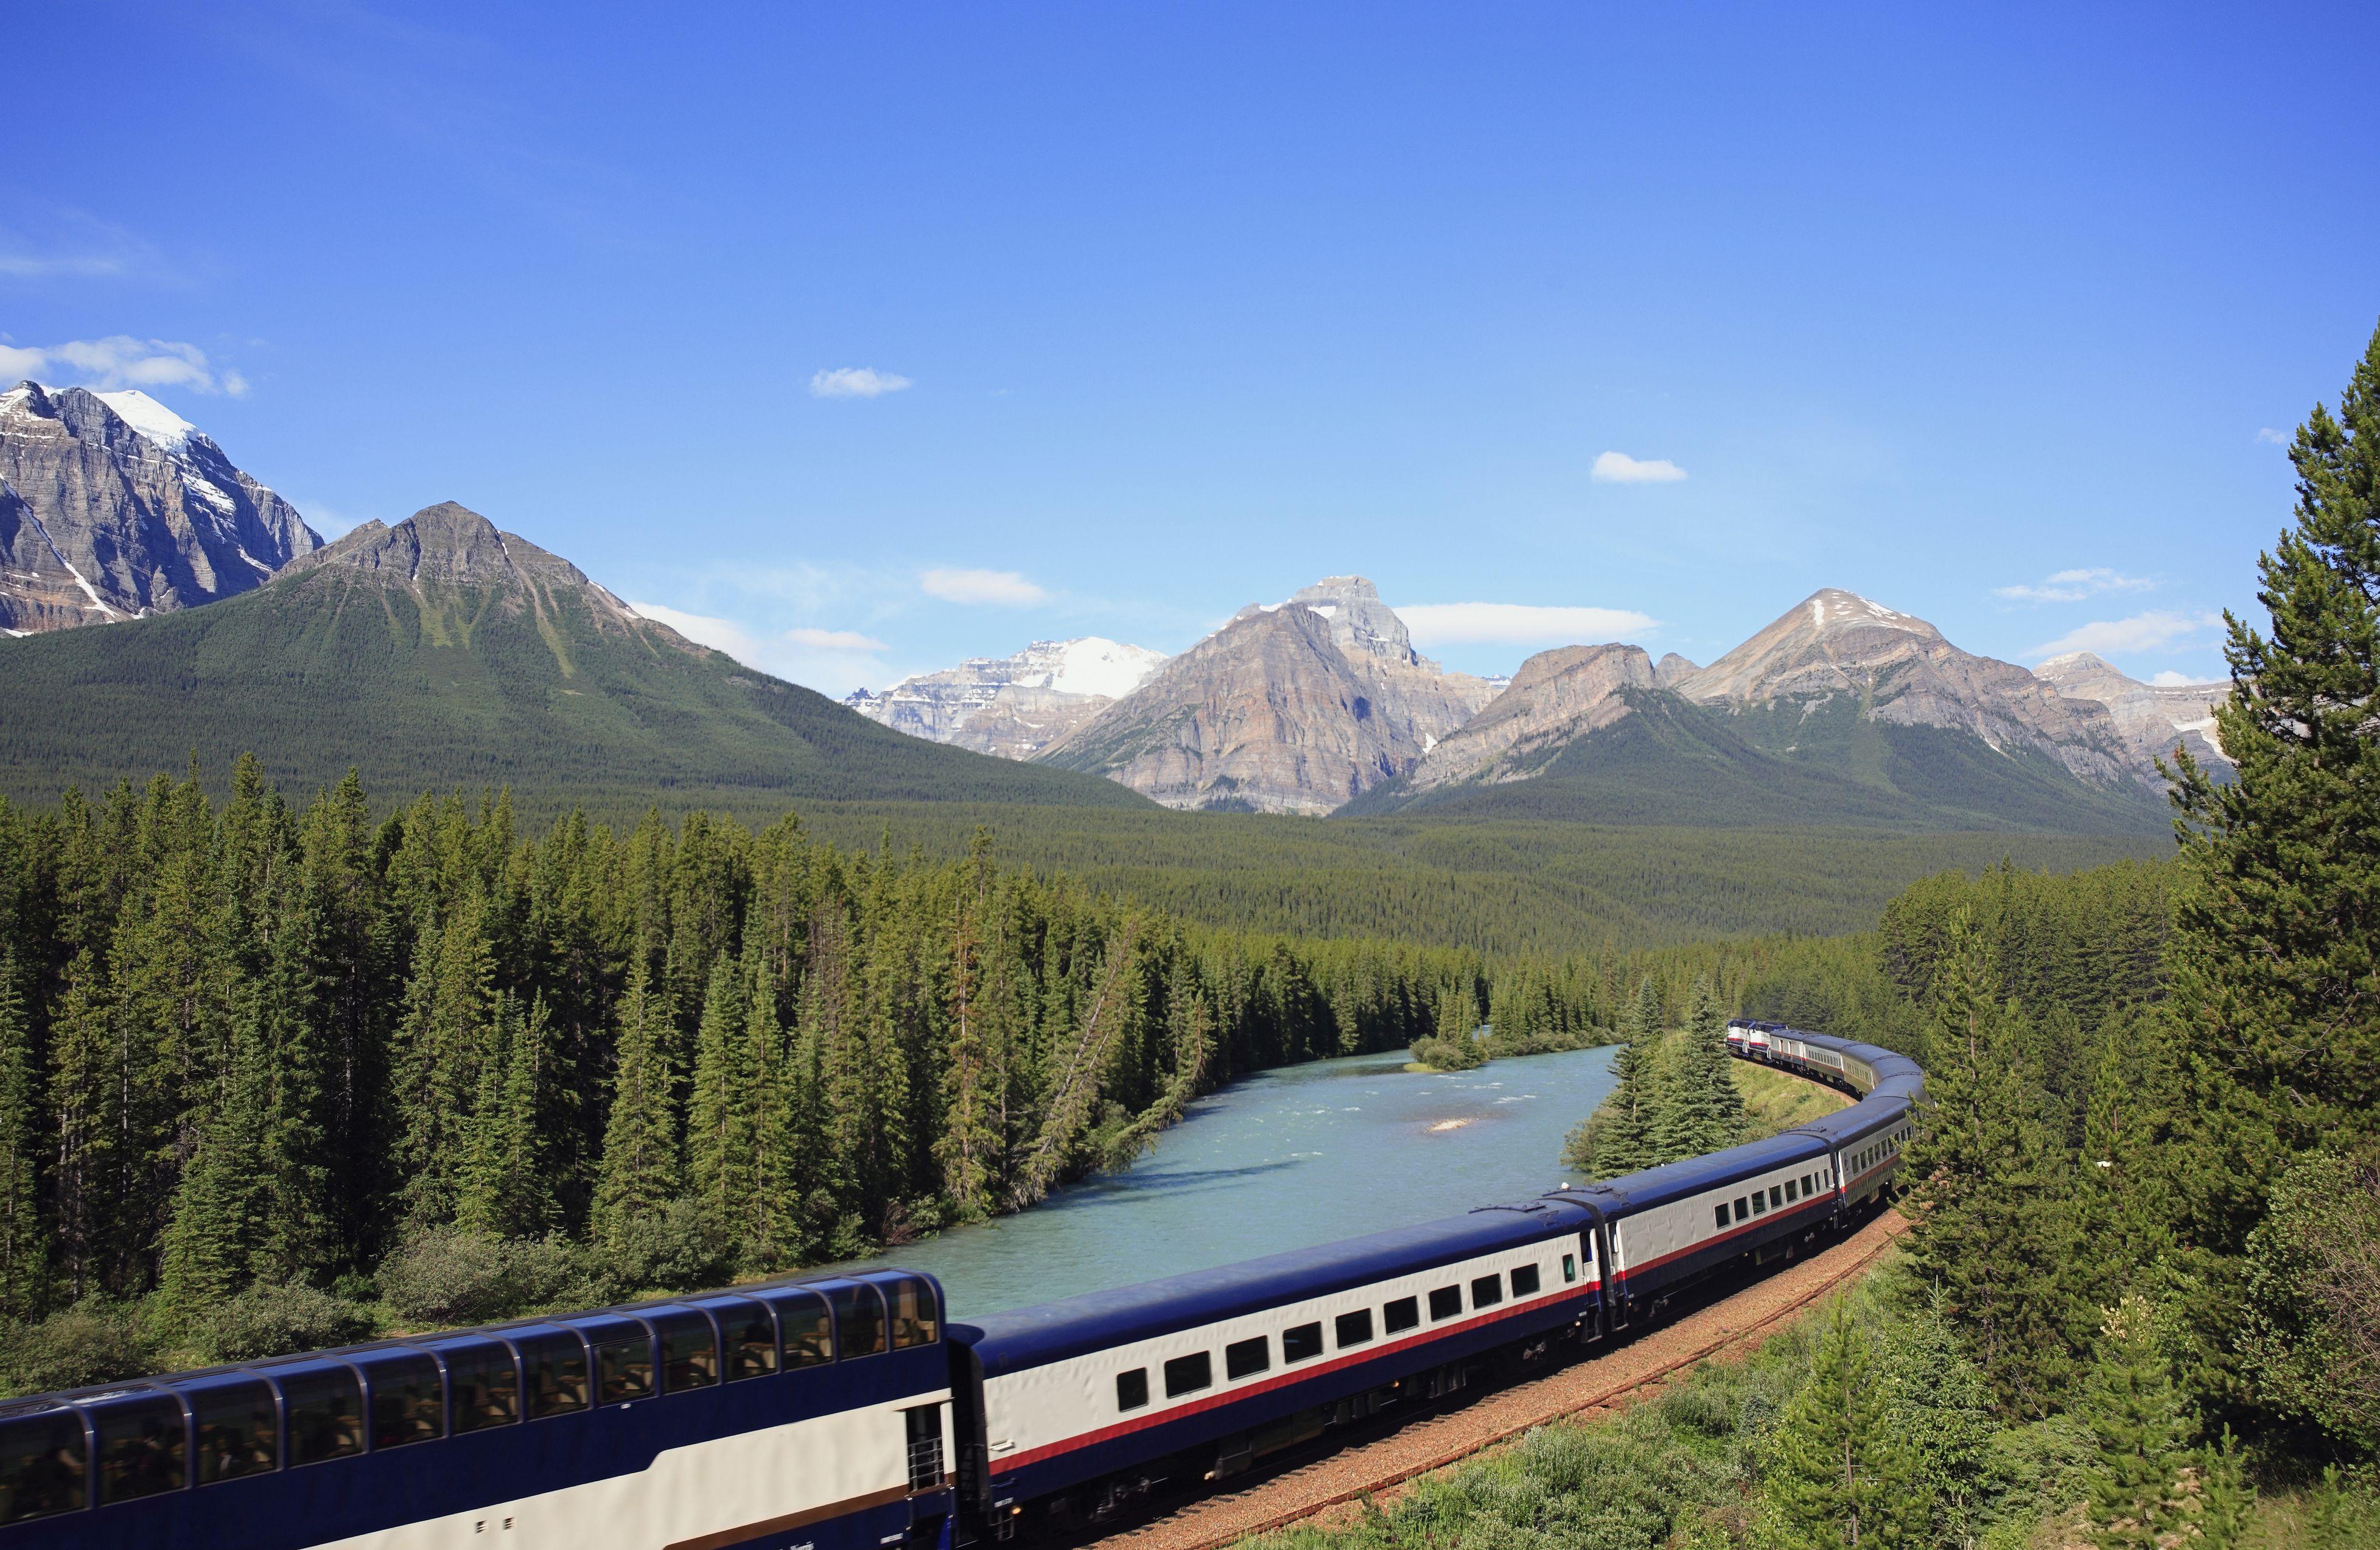 5 best train trips in Canada